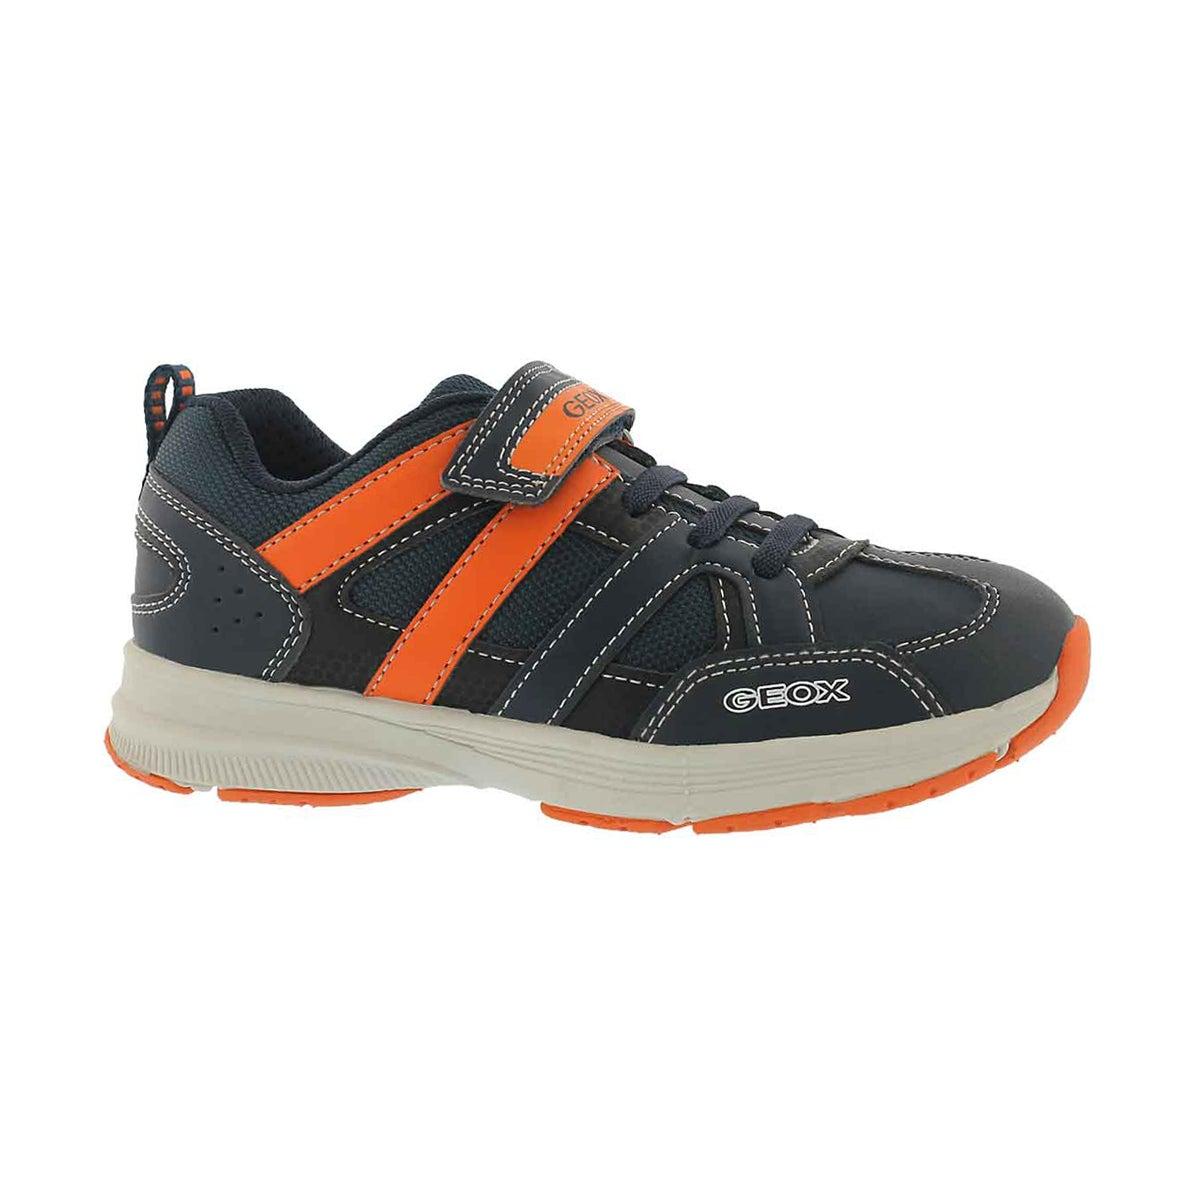 Orthopedic Shoes Toronto Scarborough